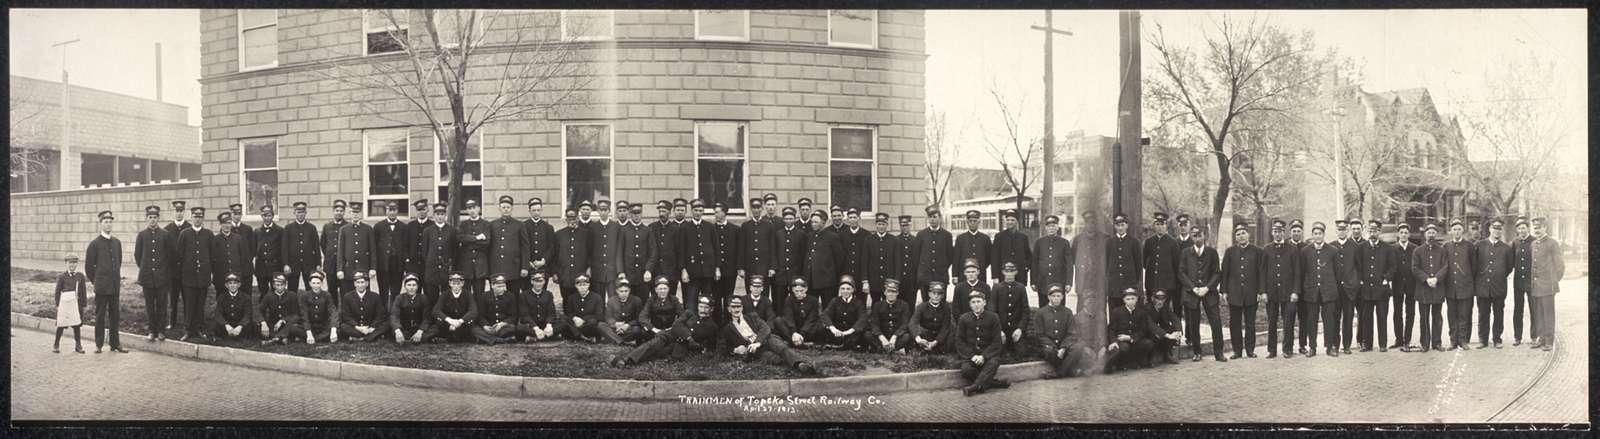 Trainmen of Topeka Street Railway Co., Apil [sic] 27, 1913